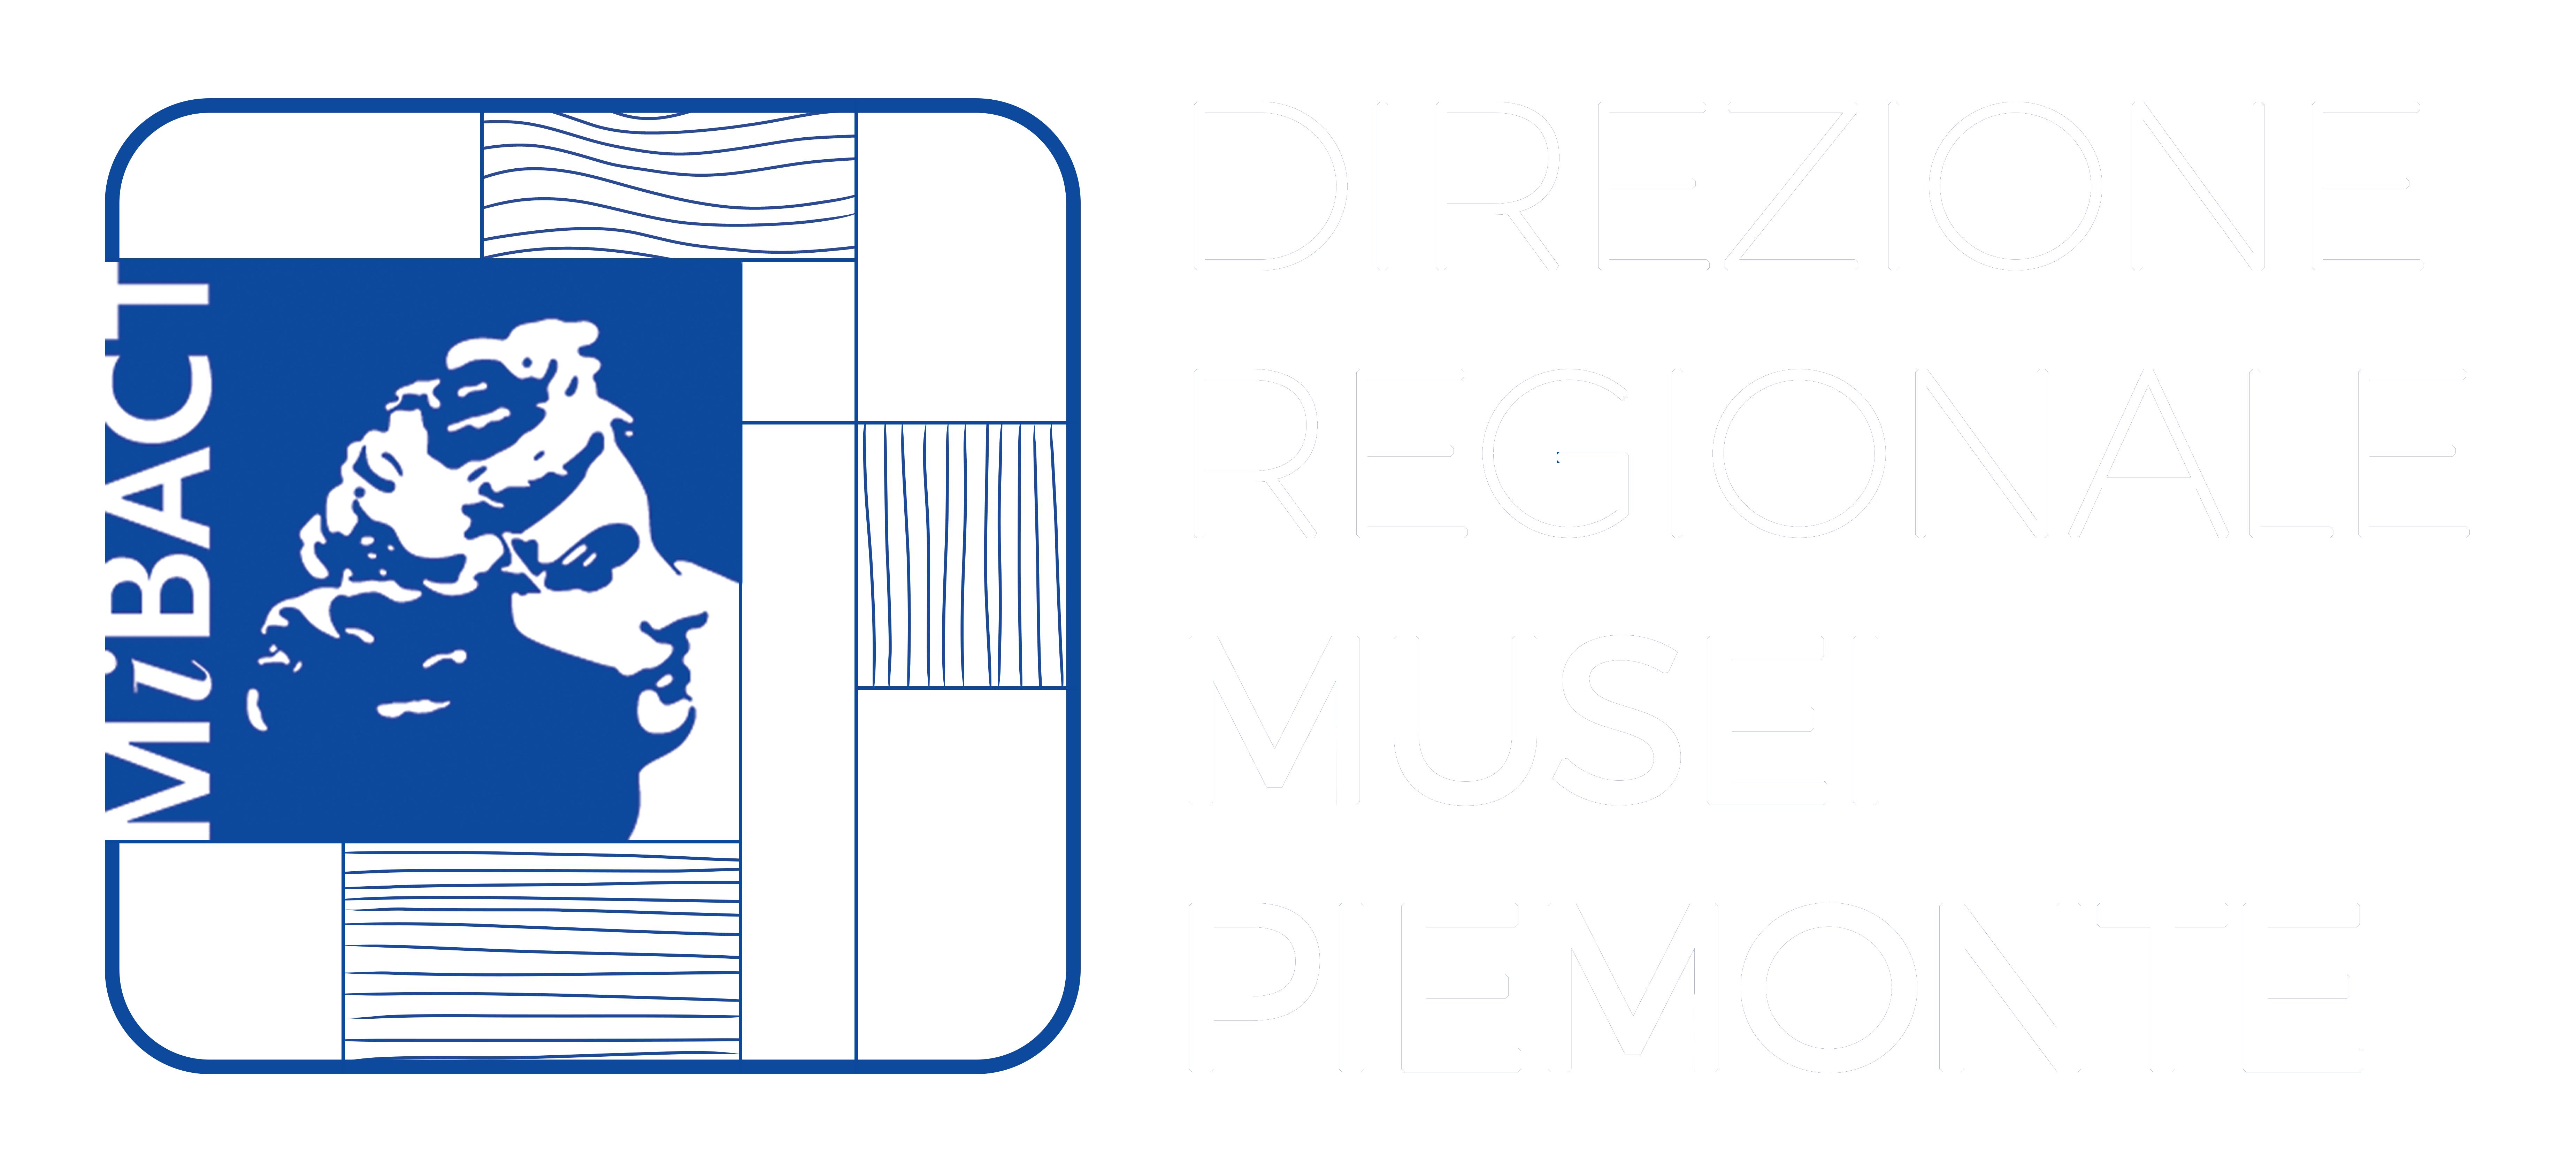 DIREZIONE REGIONALE MUSEI PIEMONTE